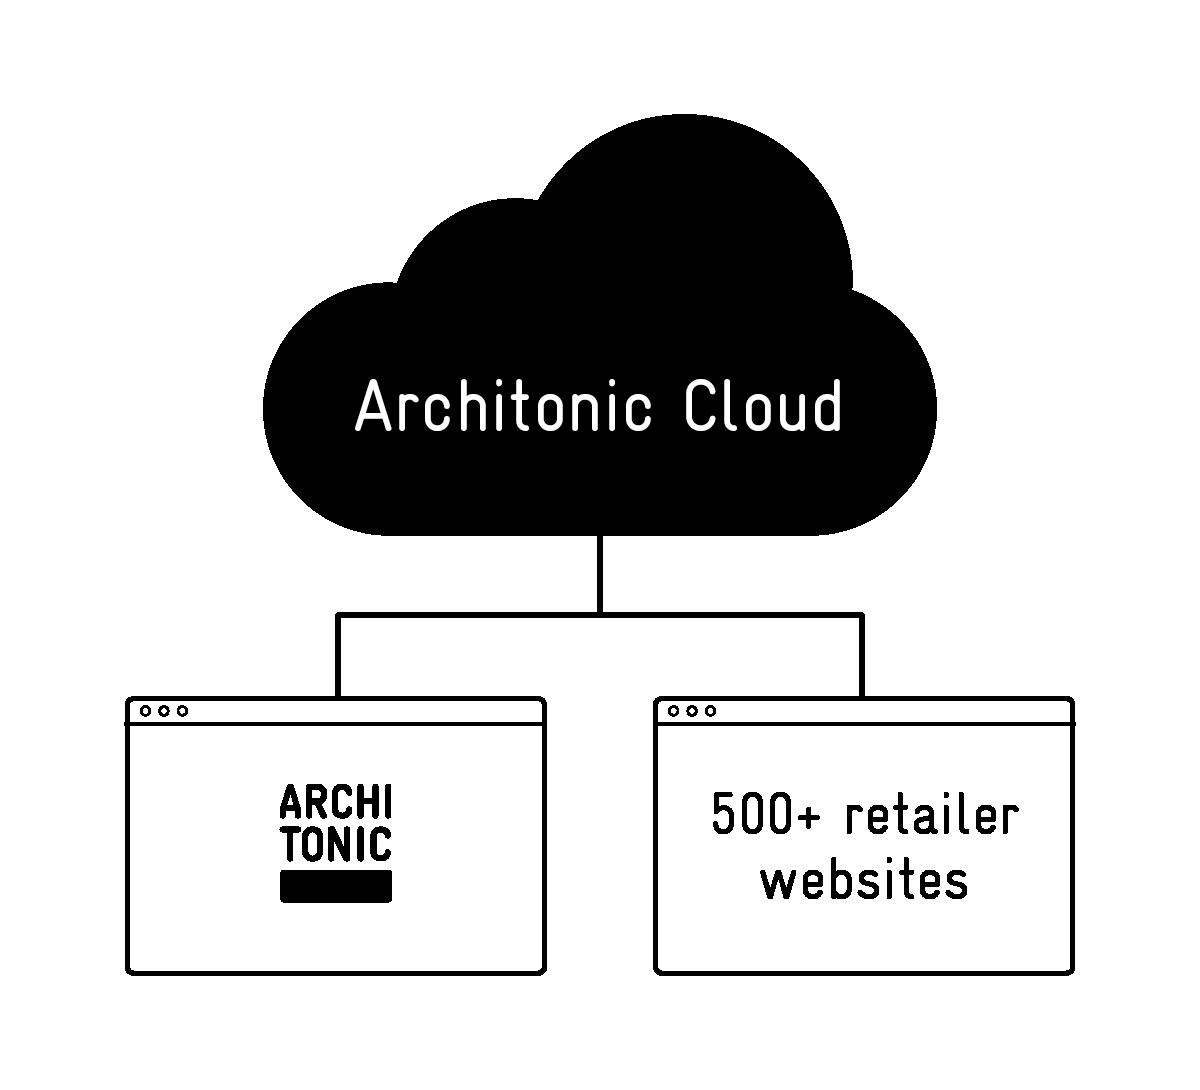 retailer-websites_architonic-cloud.png